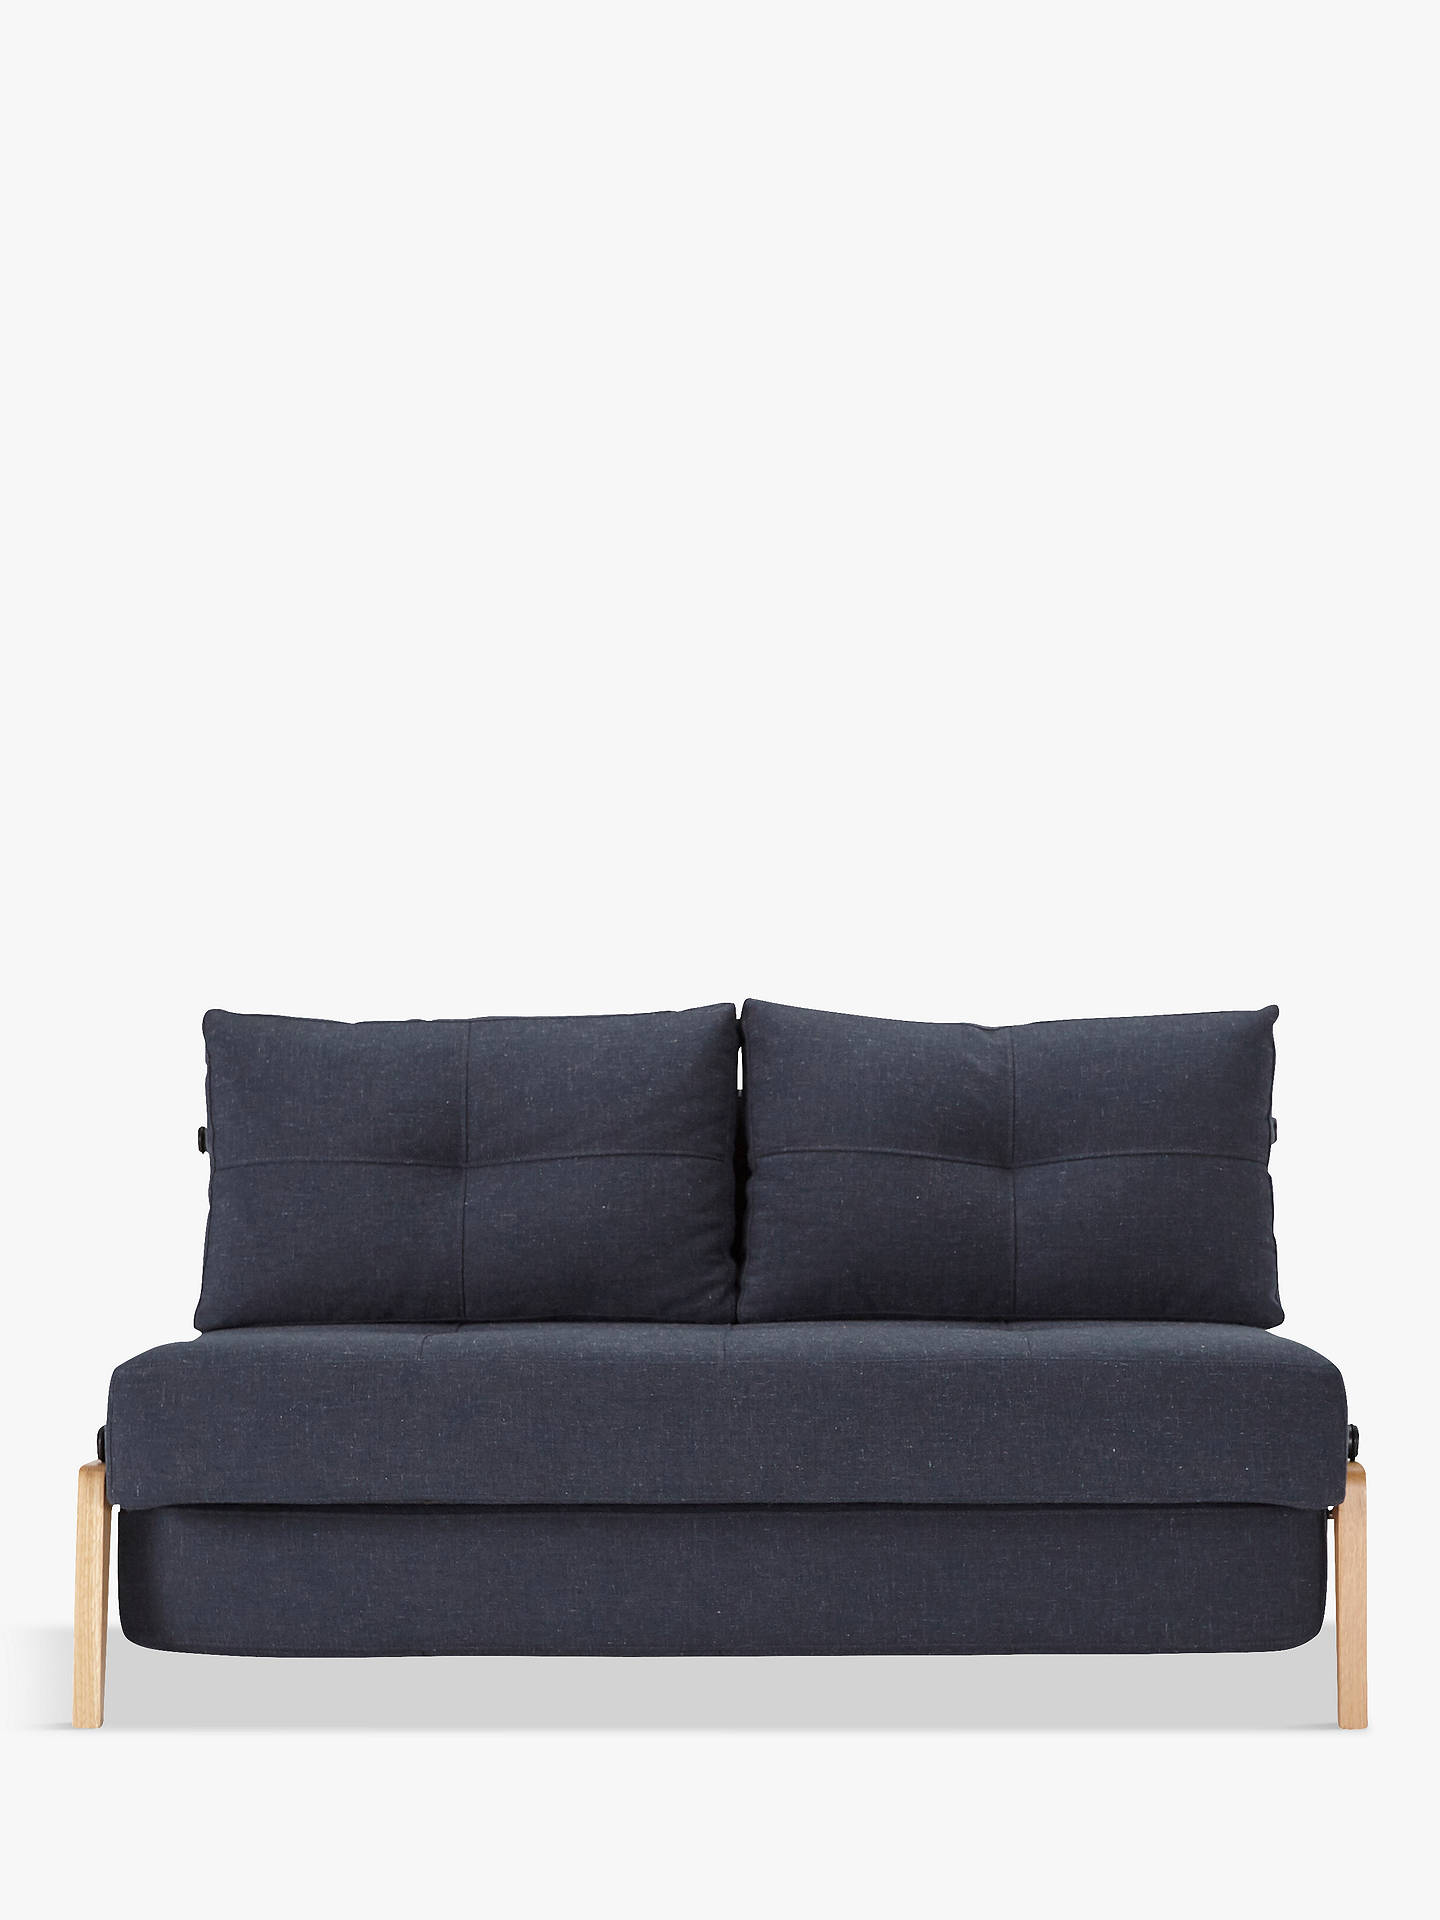 Innovation Cubed 140 Sofa Bed With Serpentine Sprung Foam Mattress Nist Blue Online At Johnlewis